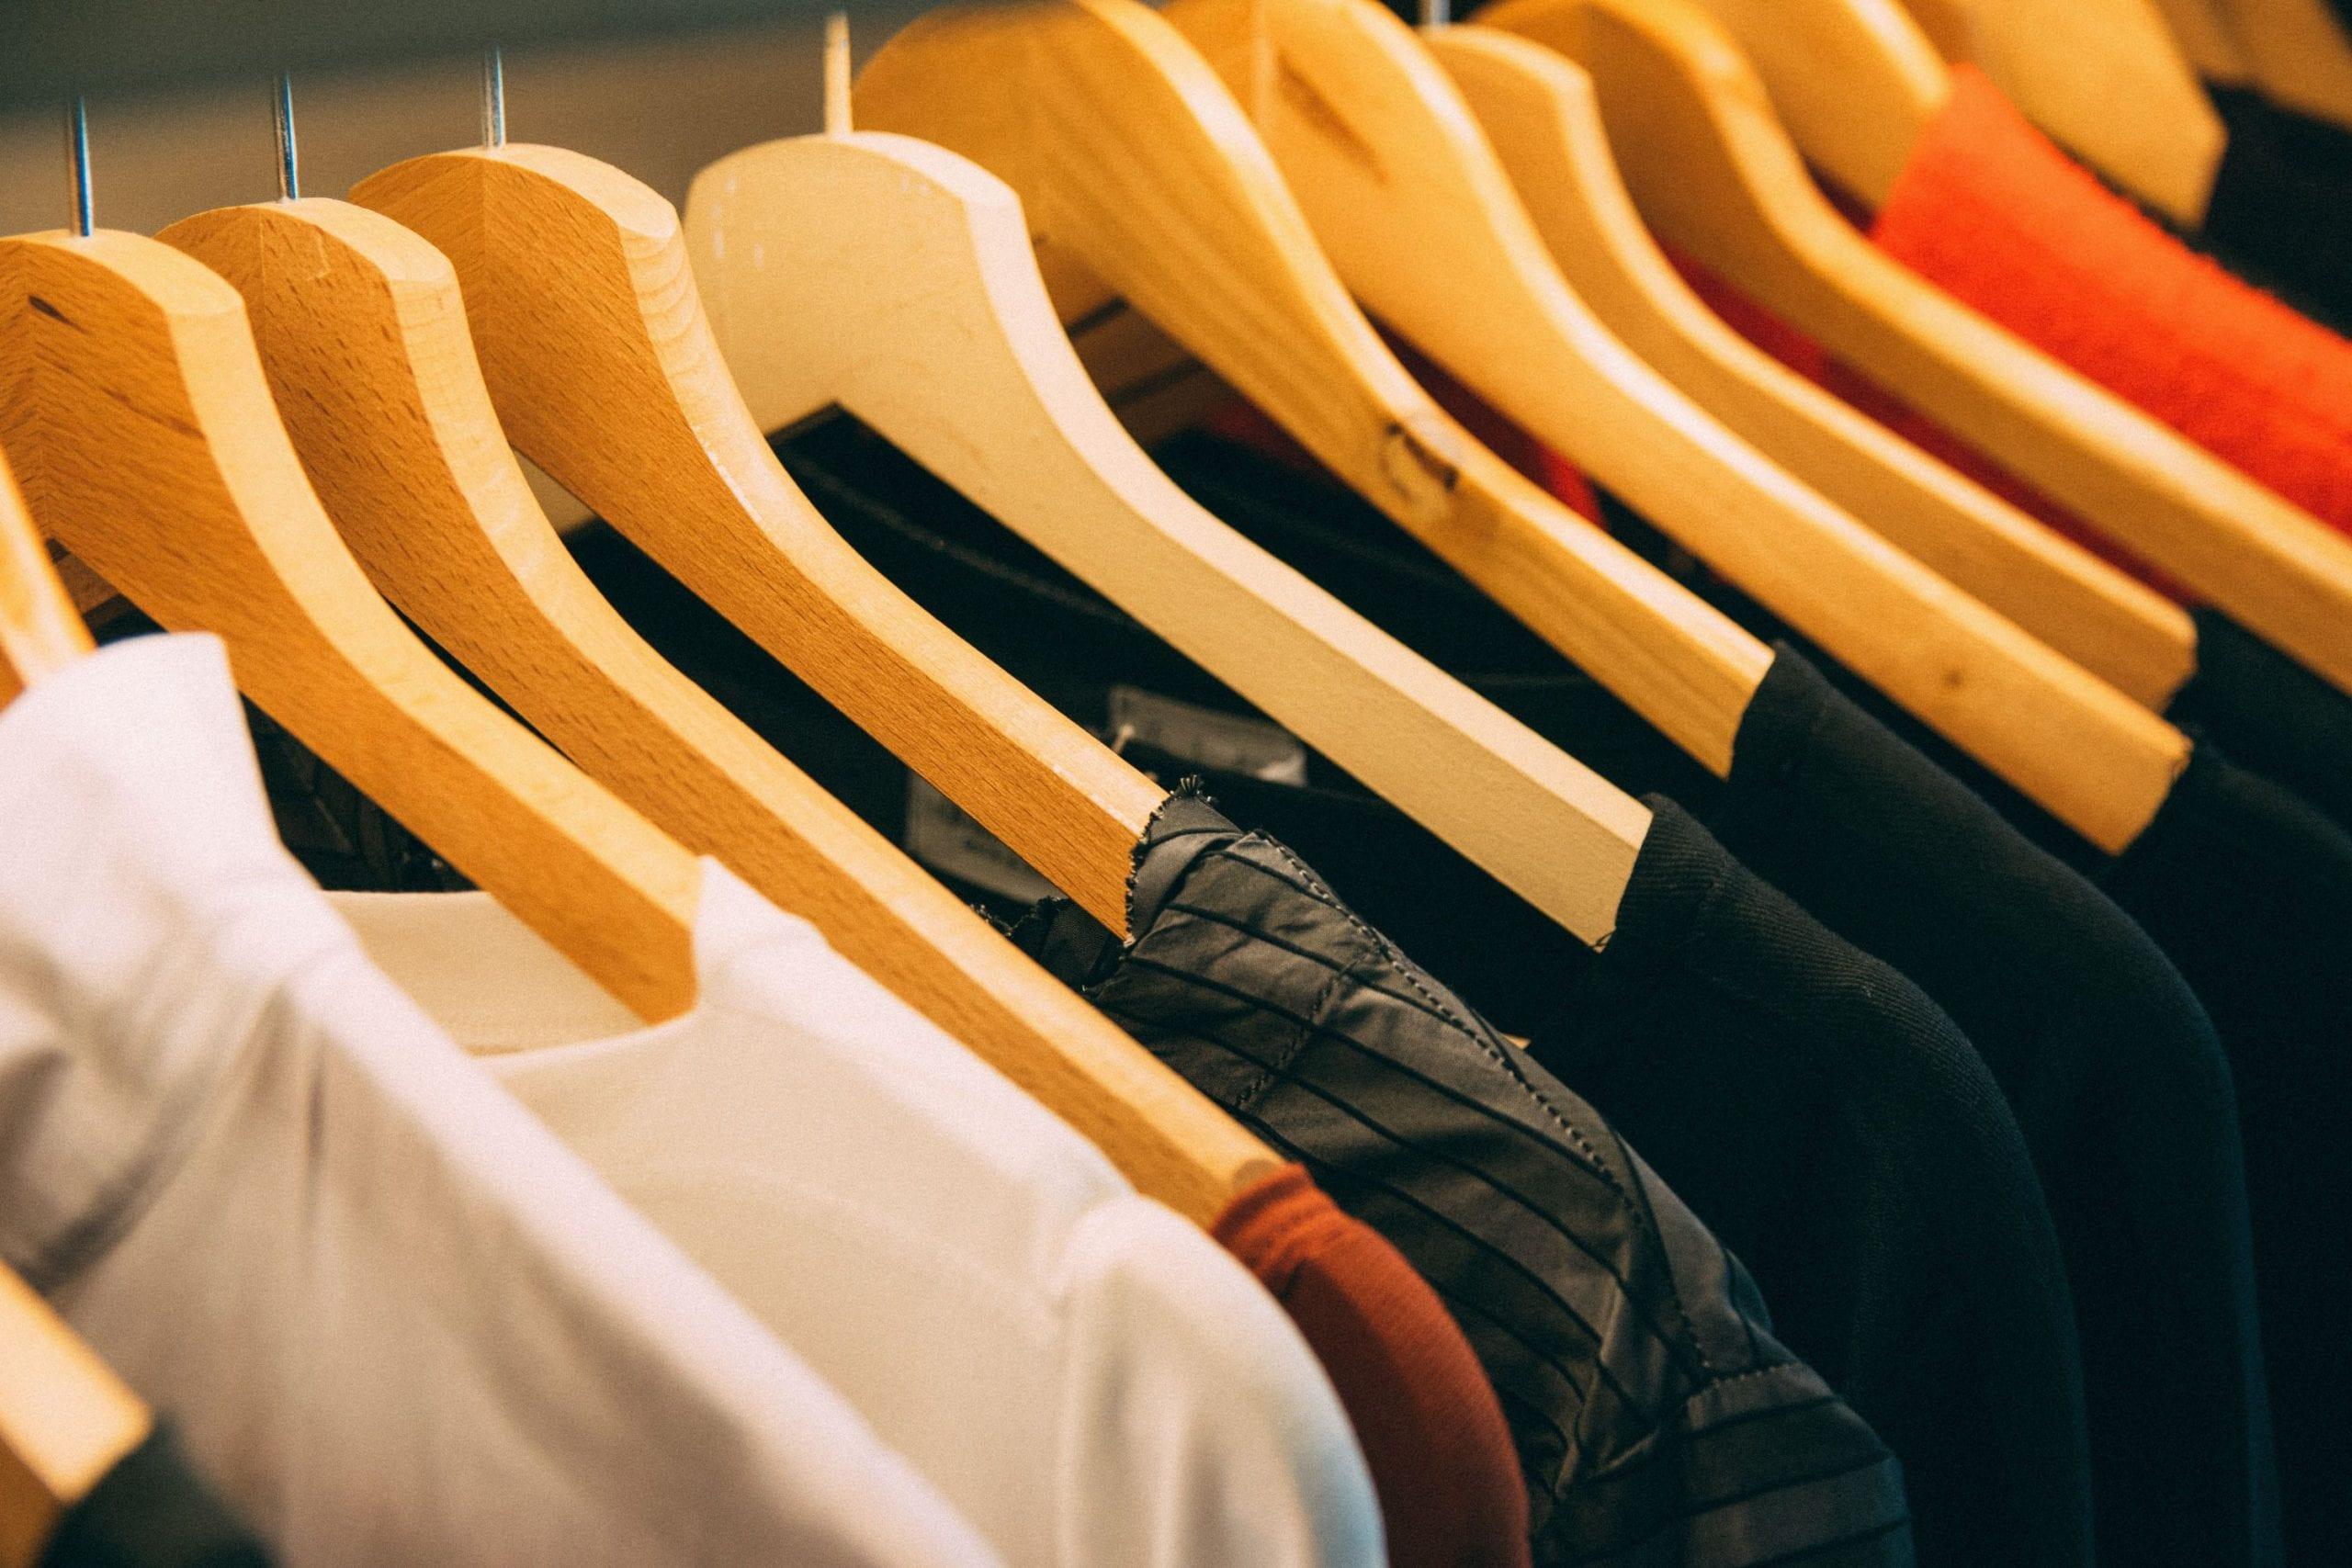 cabinet-clothes-clothes-hanger-996329